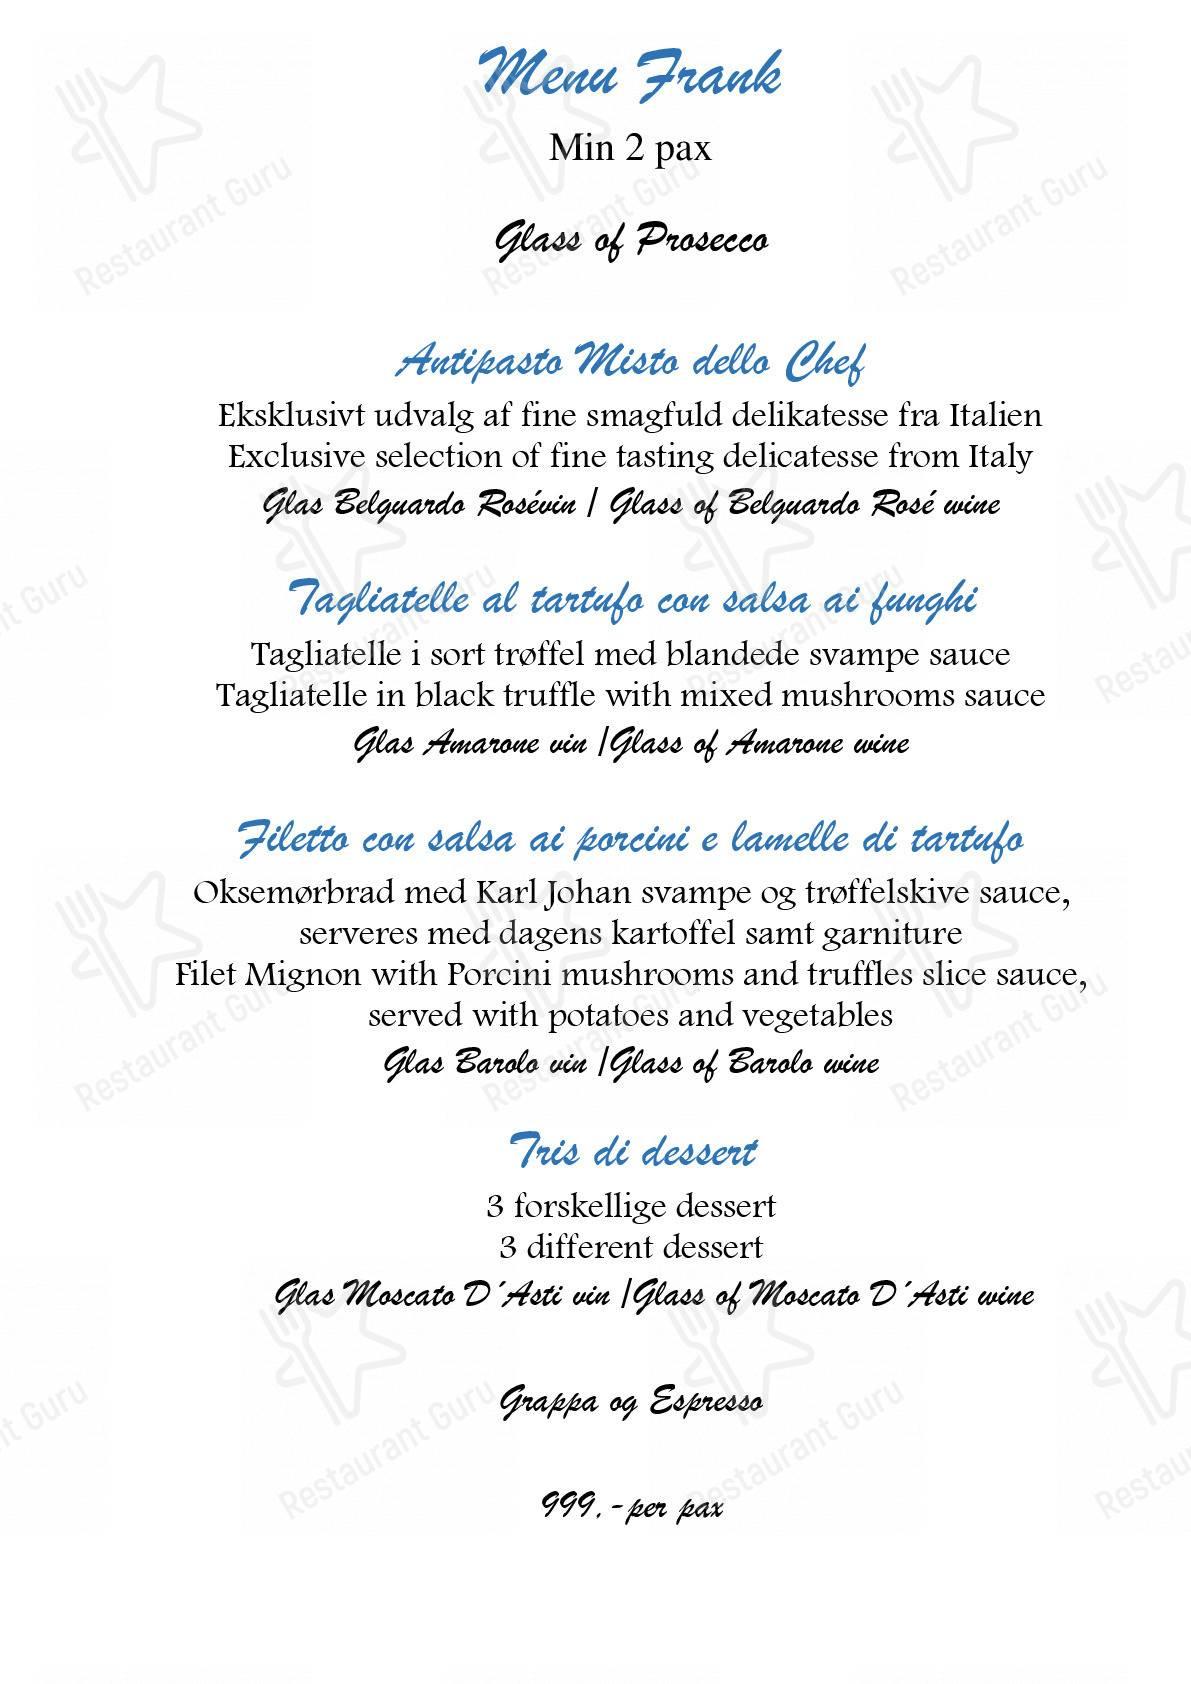 La Dolce Vita menu - dishes and beverages